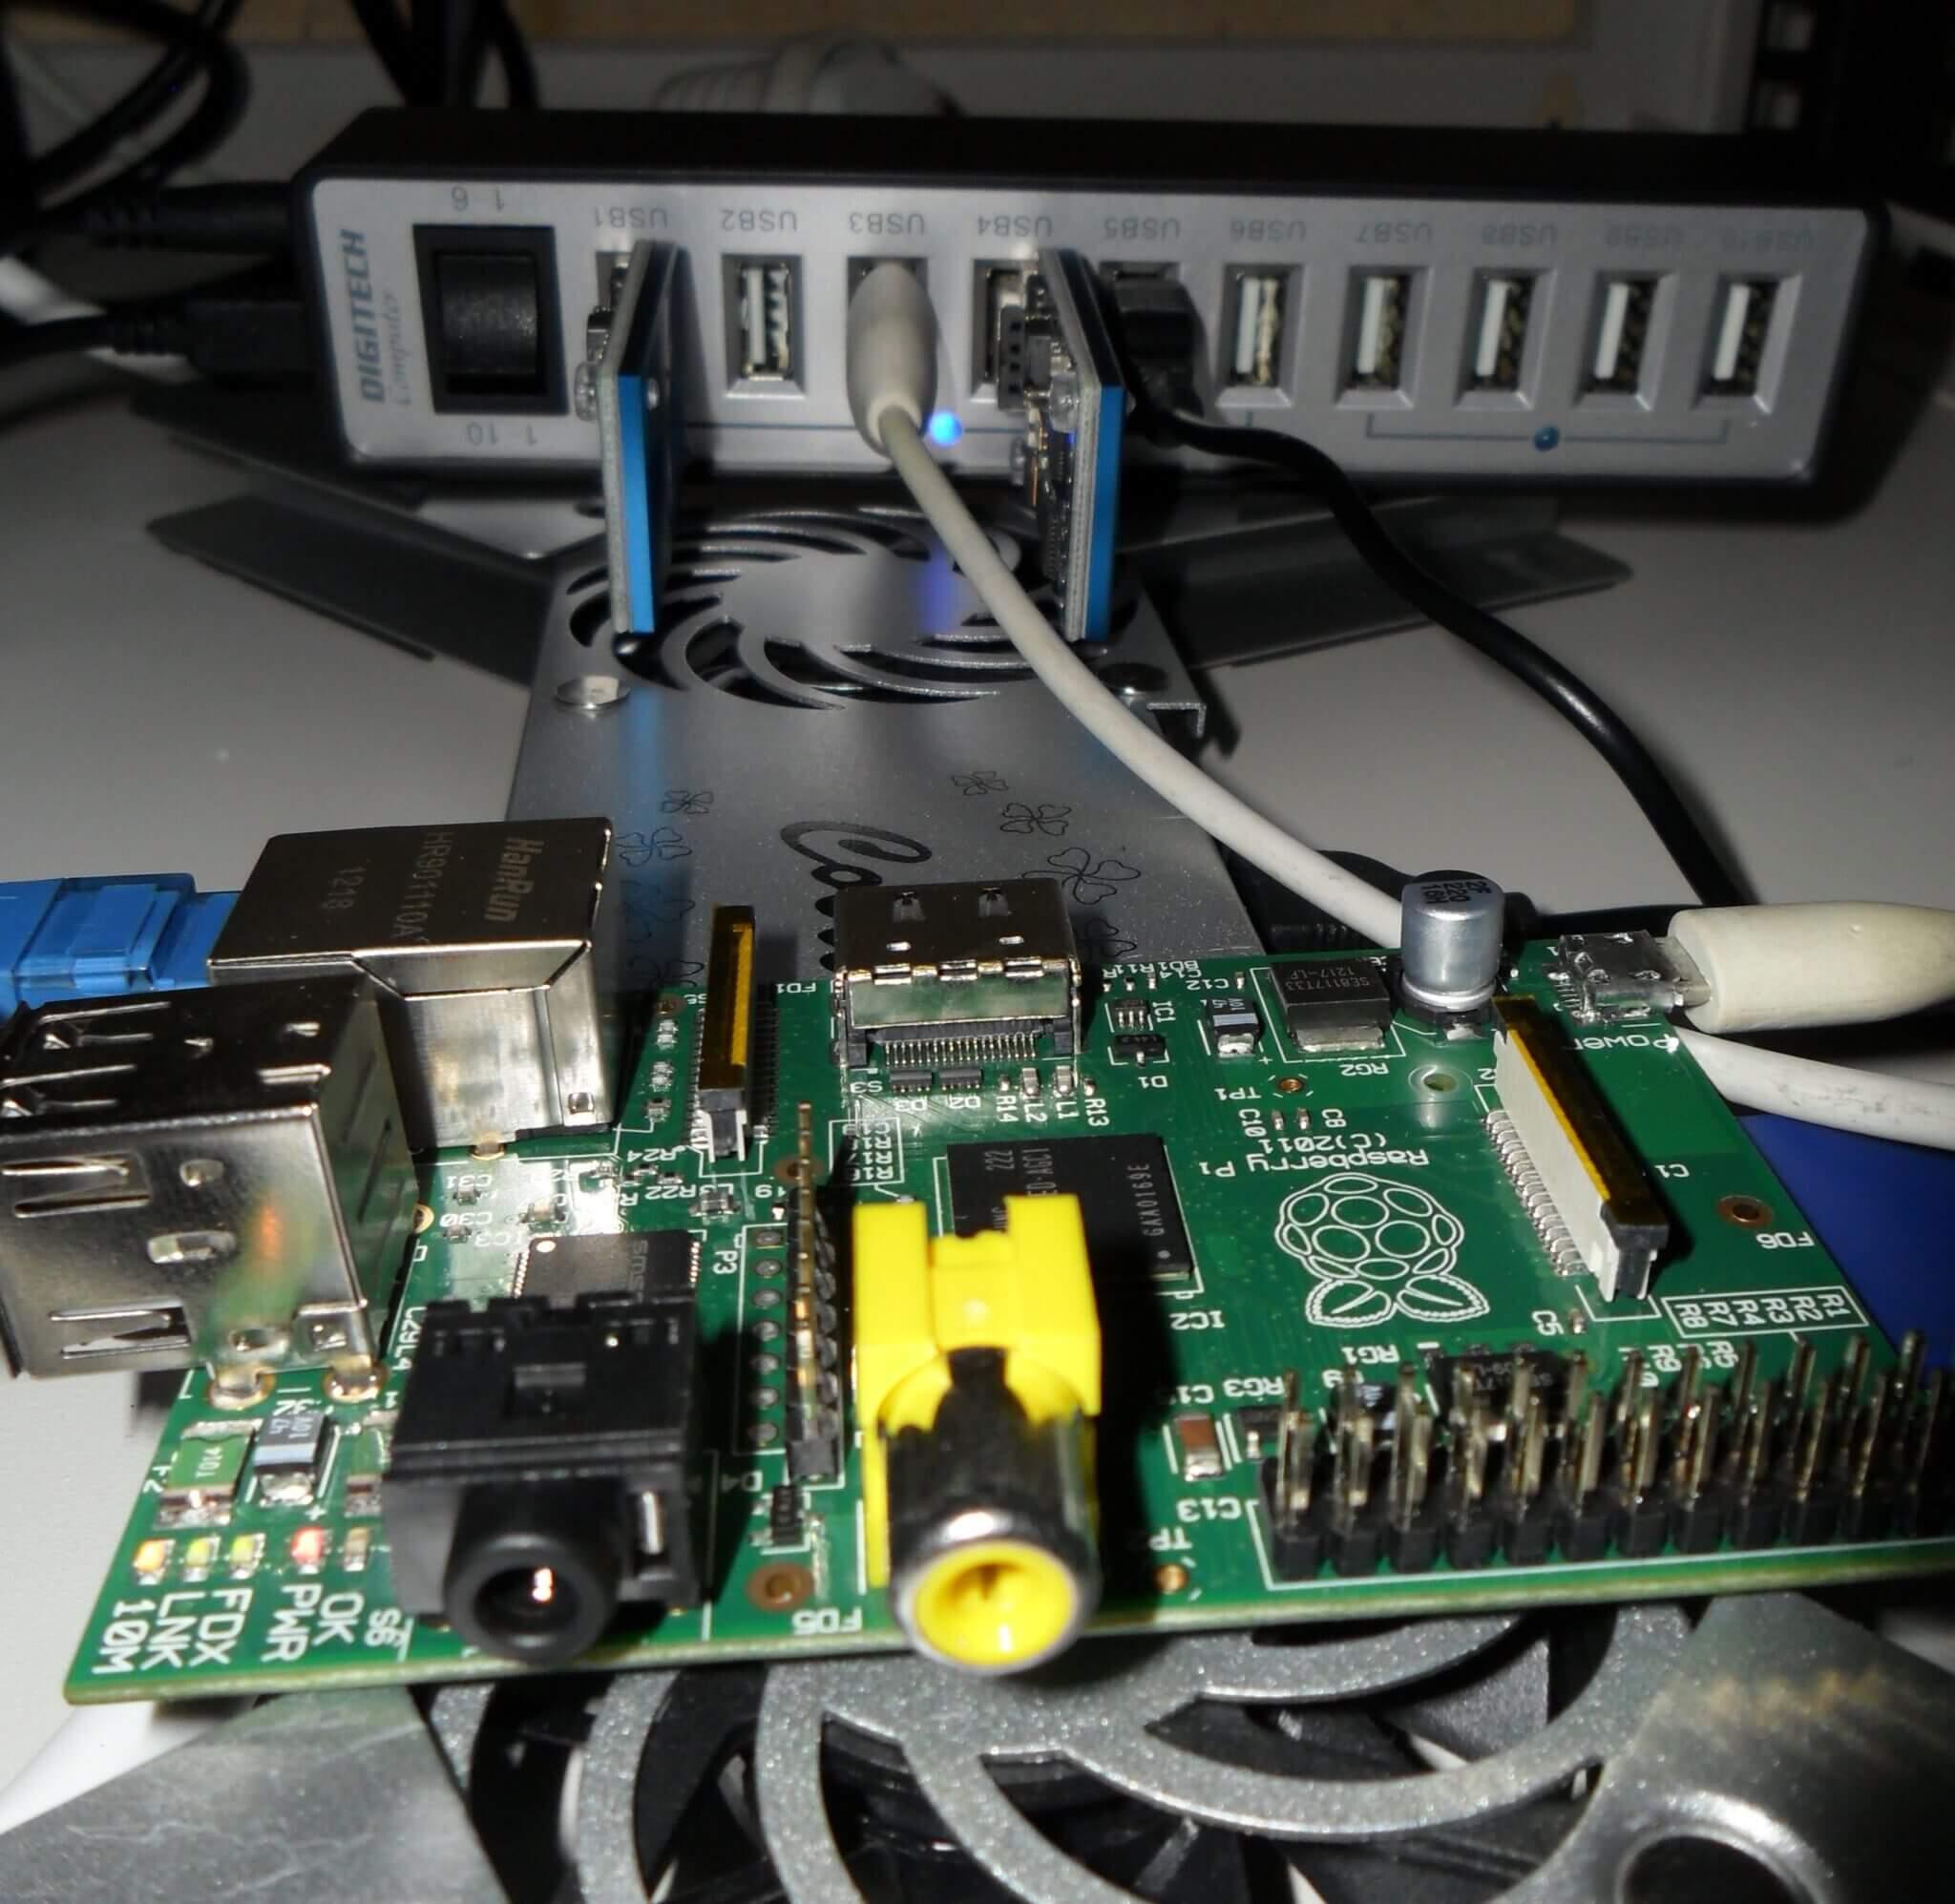 Bitcoin Mining with a Raspberry Pi